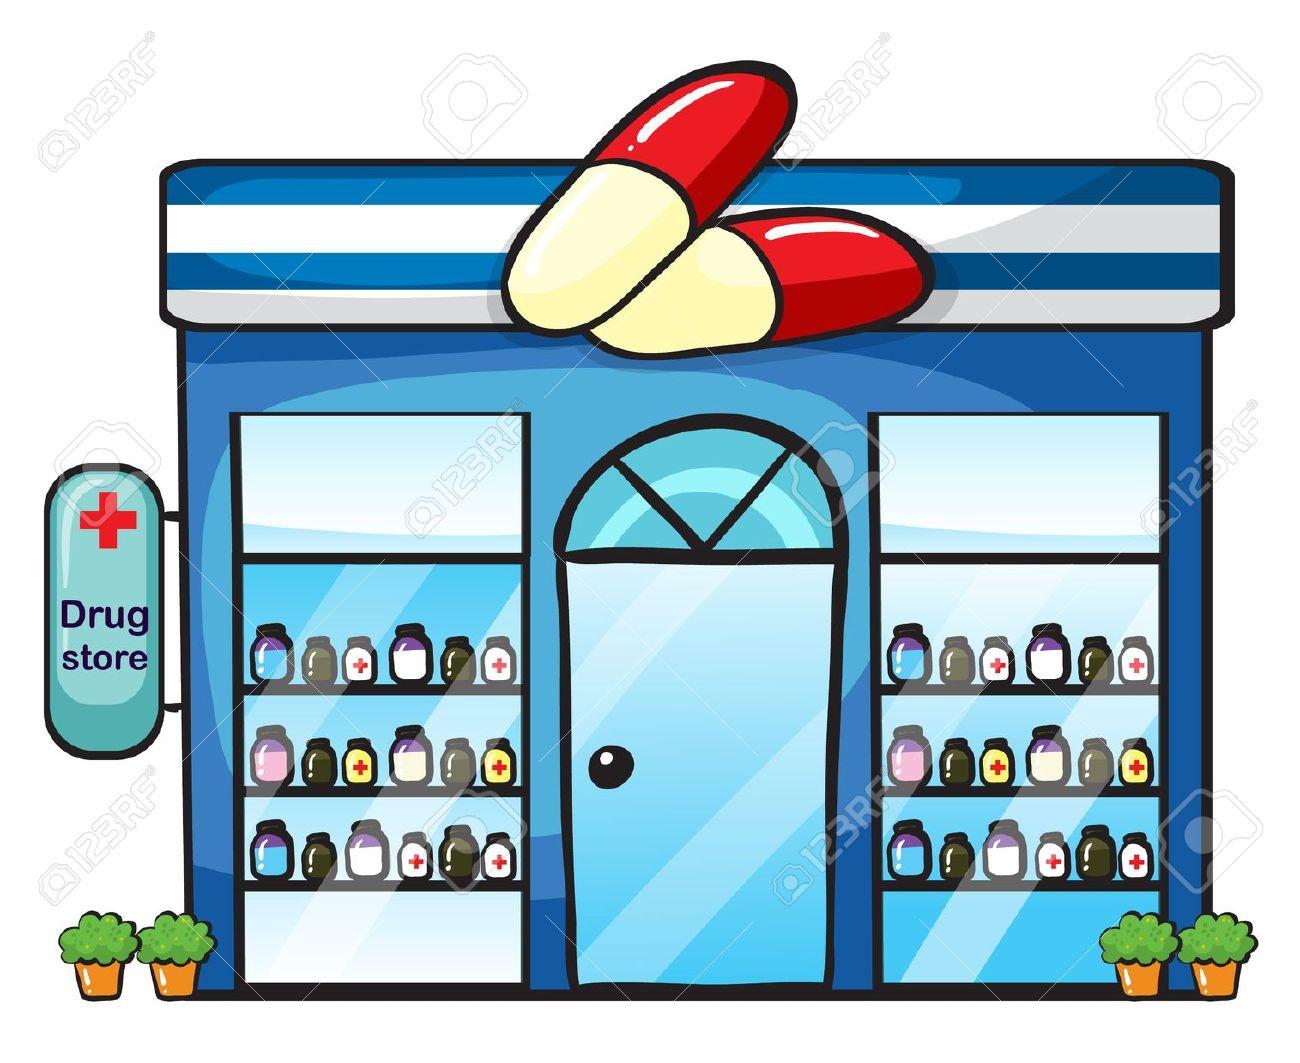 Drugstore clipart.